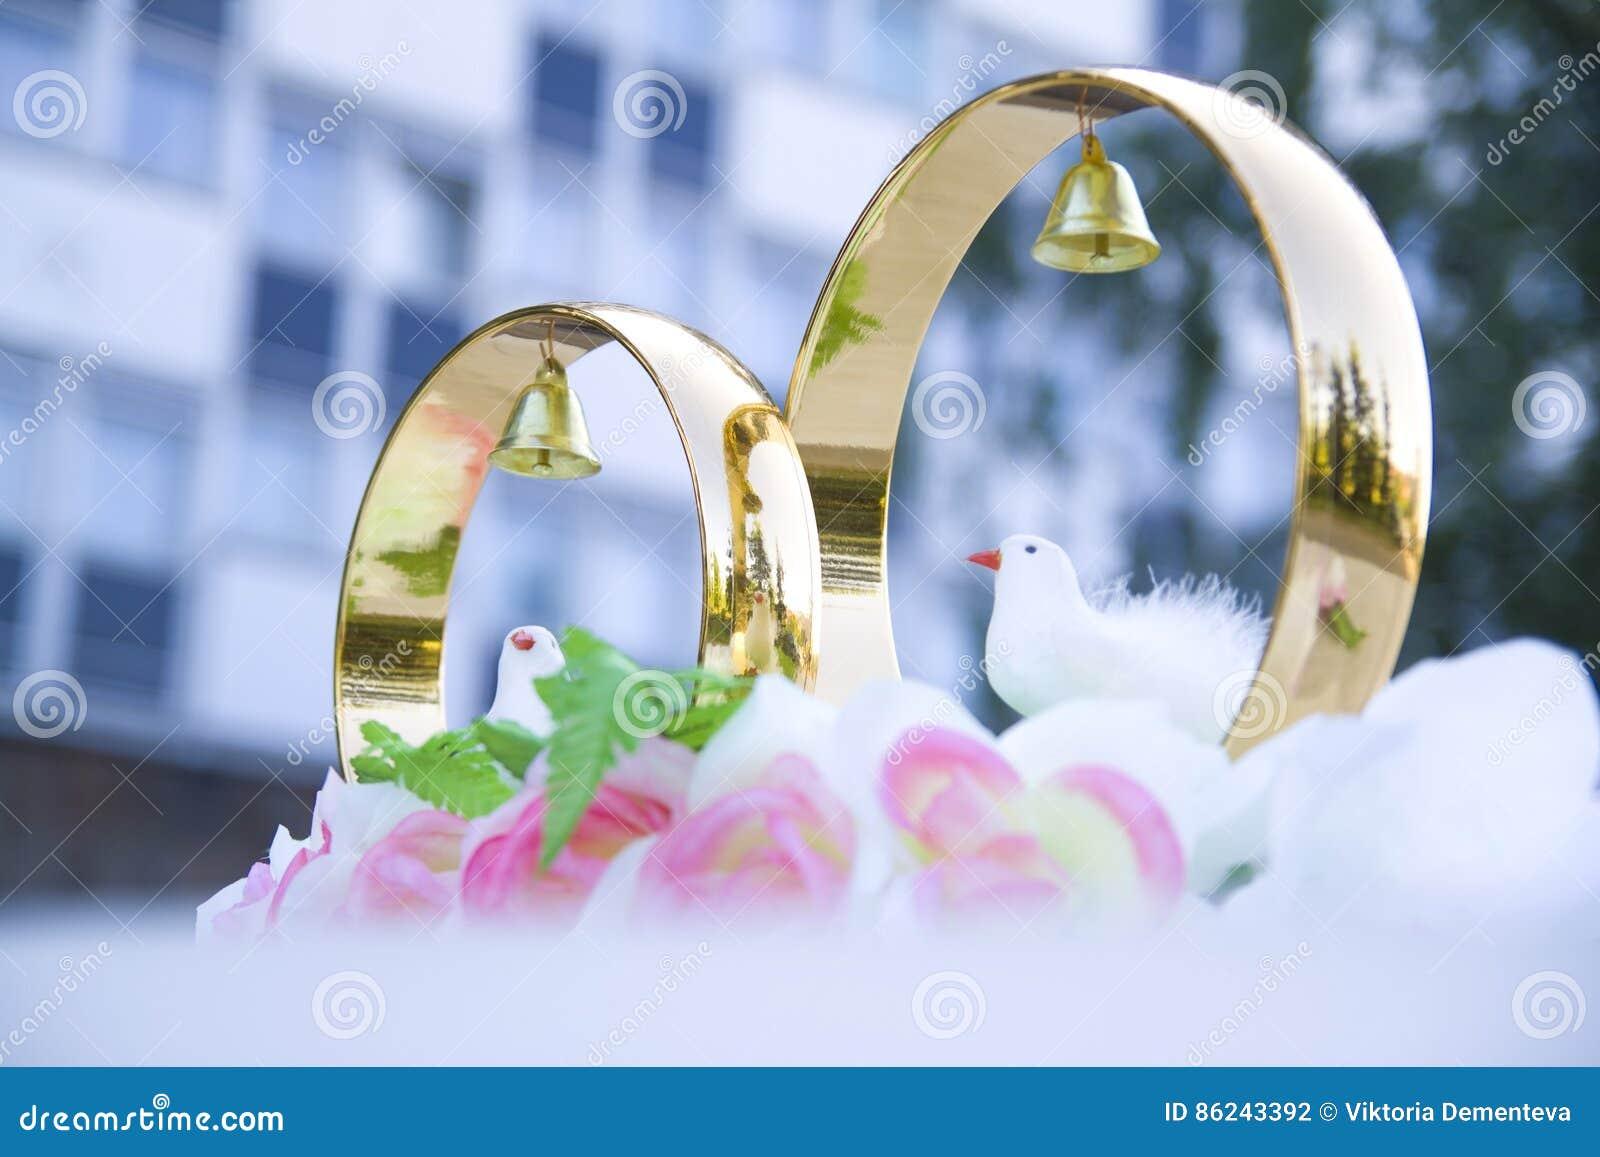 Wedding props wedding rings flowers wedding decoration items wedding props wedding rings flowers wedding decoration items rings decorations on the car junglespirit Choice Image